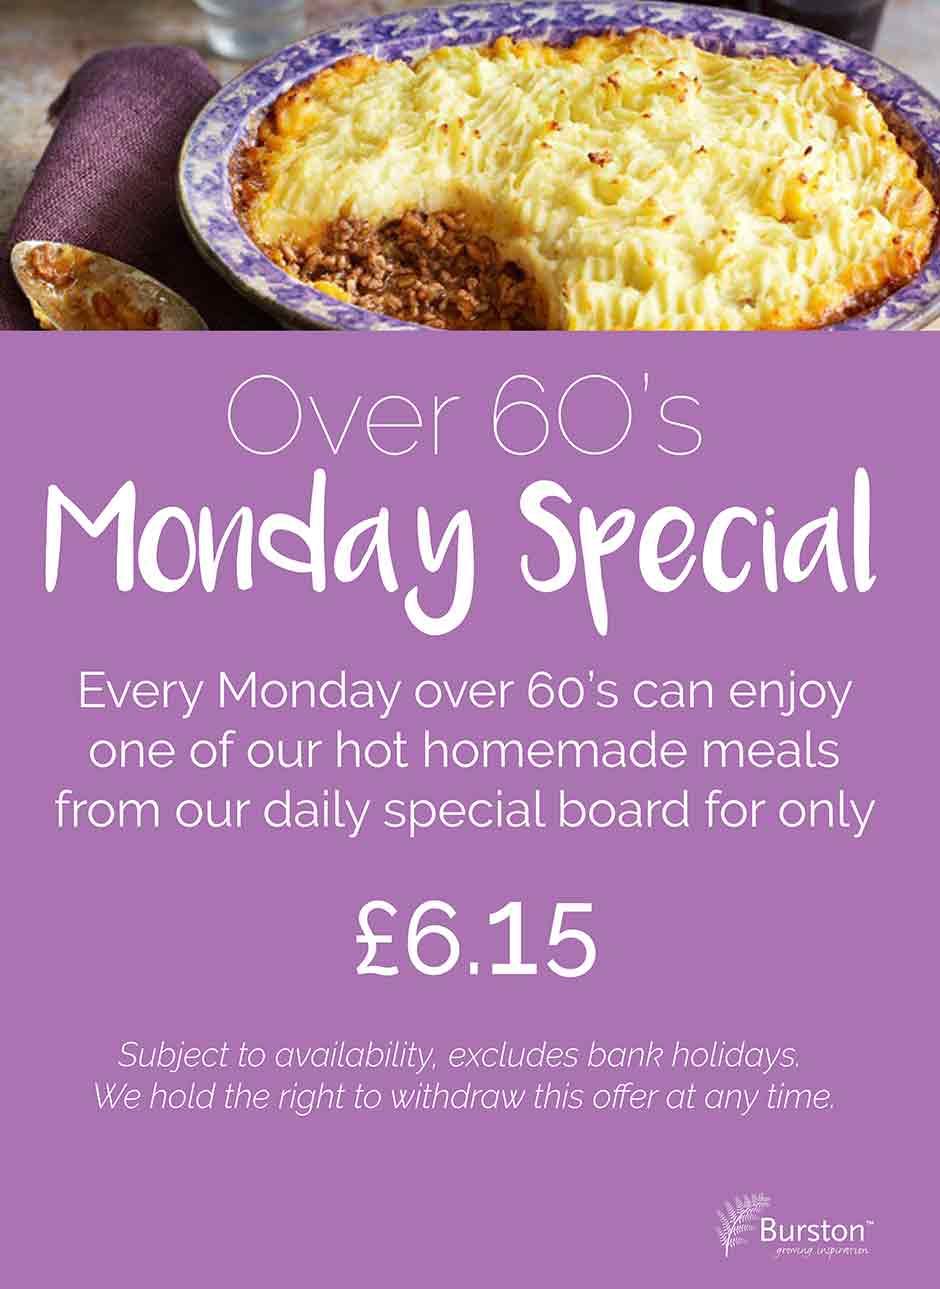 Special Offers - Burston Garden Centre Restaurant - Over 60s